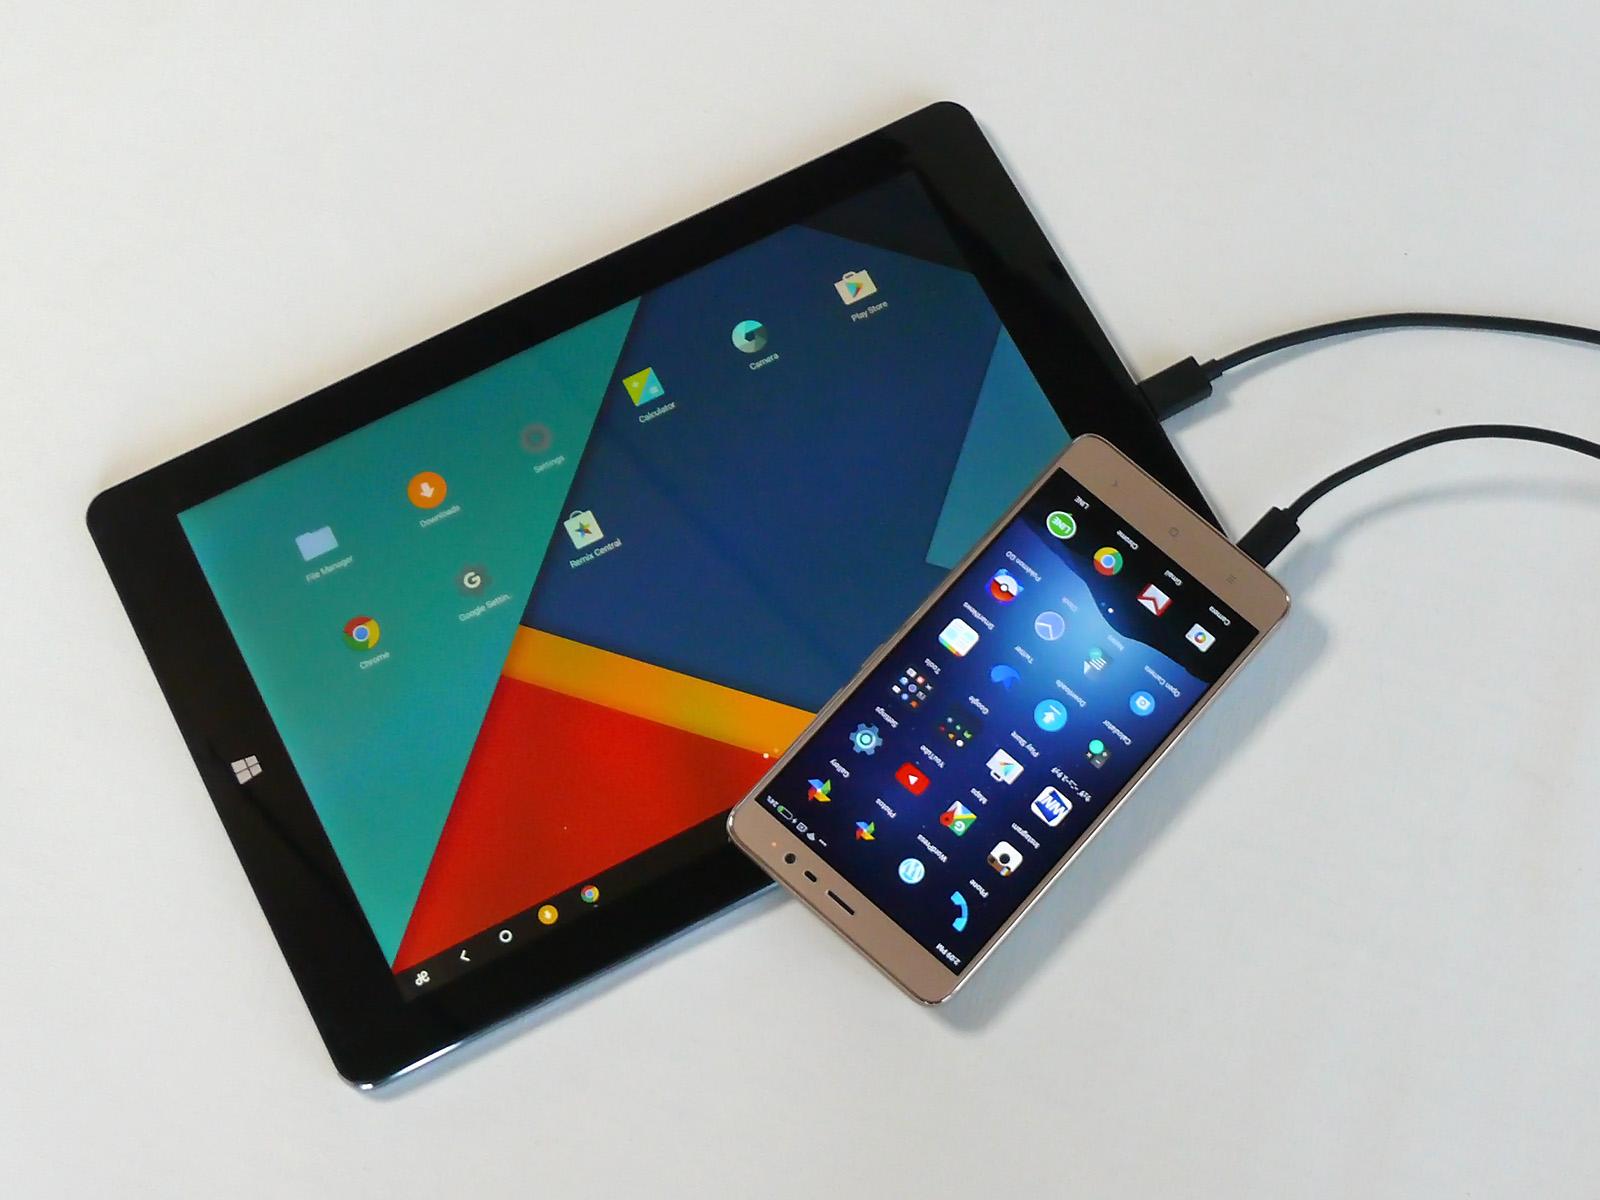 iClever USB充電器 2台同時充電可能